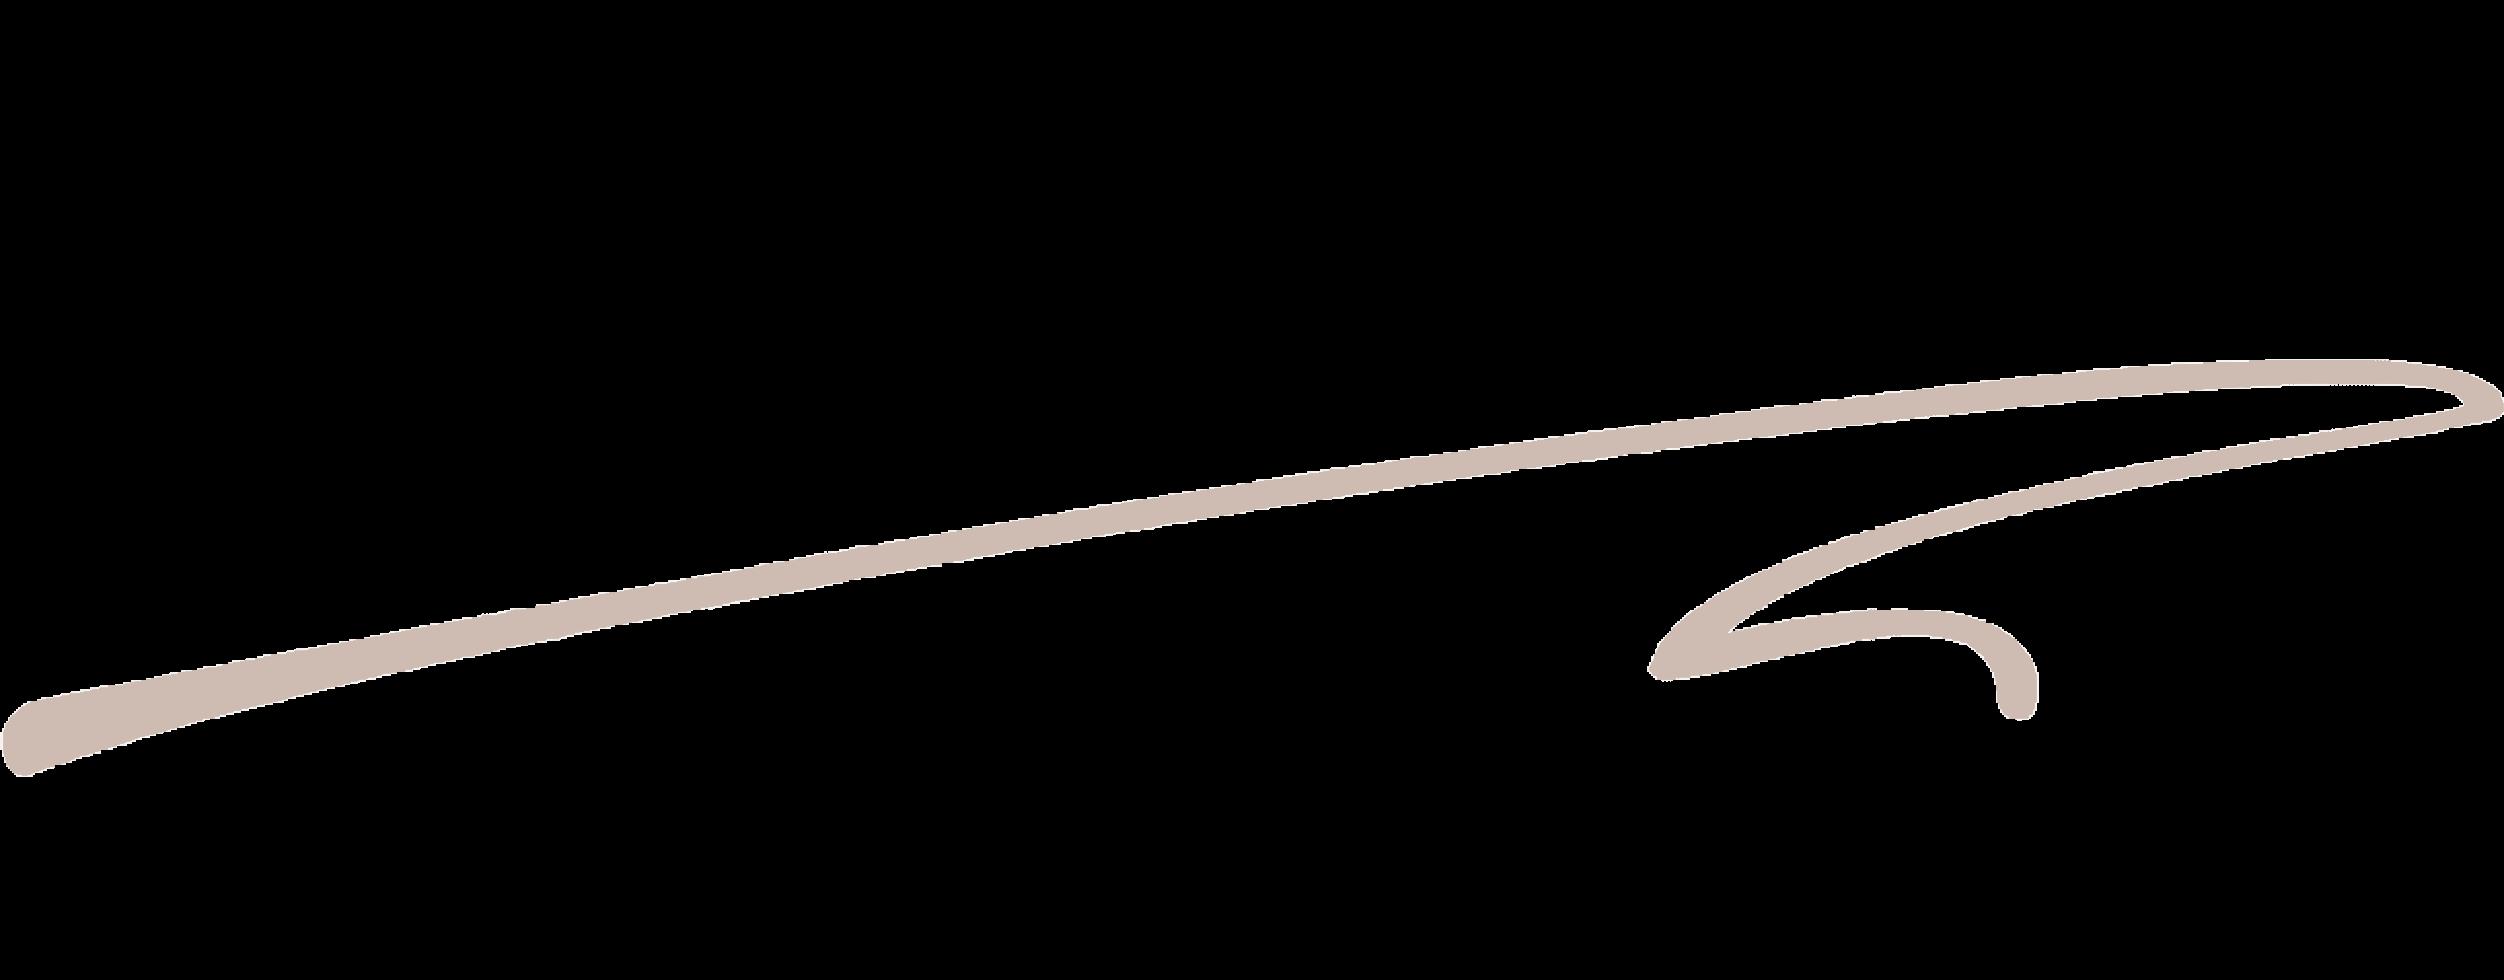 Trazo-04